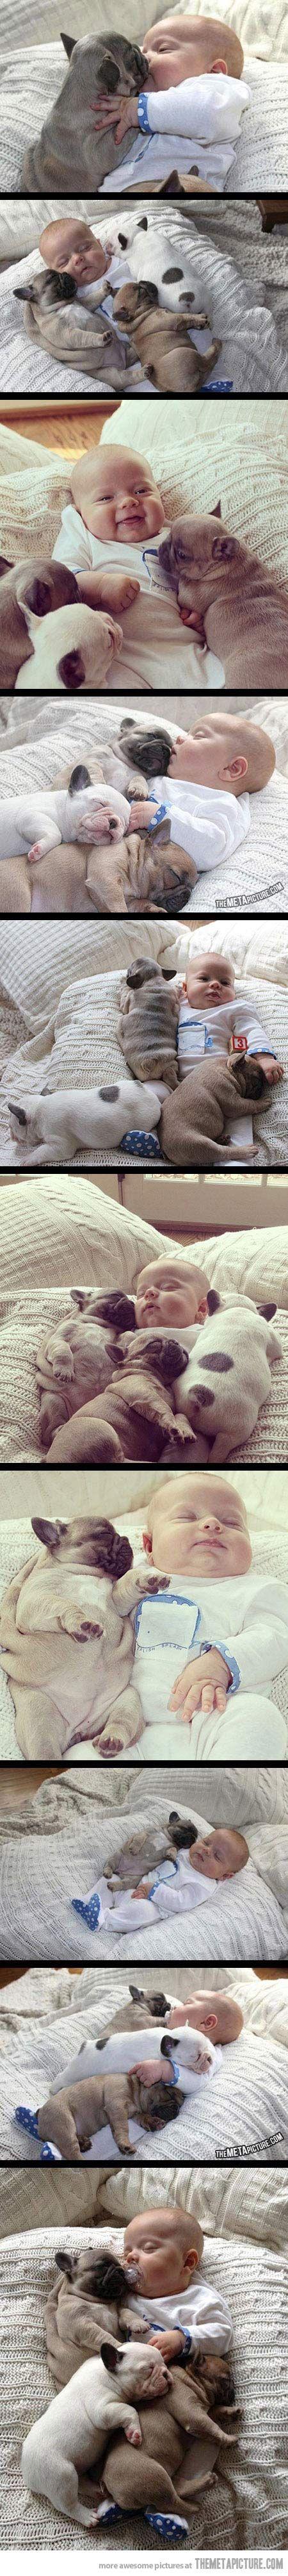 Beautiful Dogo Chubby Adorable Dog - 15a25d345c1a5cee3de083ca3bdb6aa7  Graphic_992745  .jpg